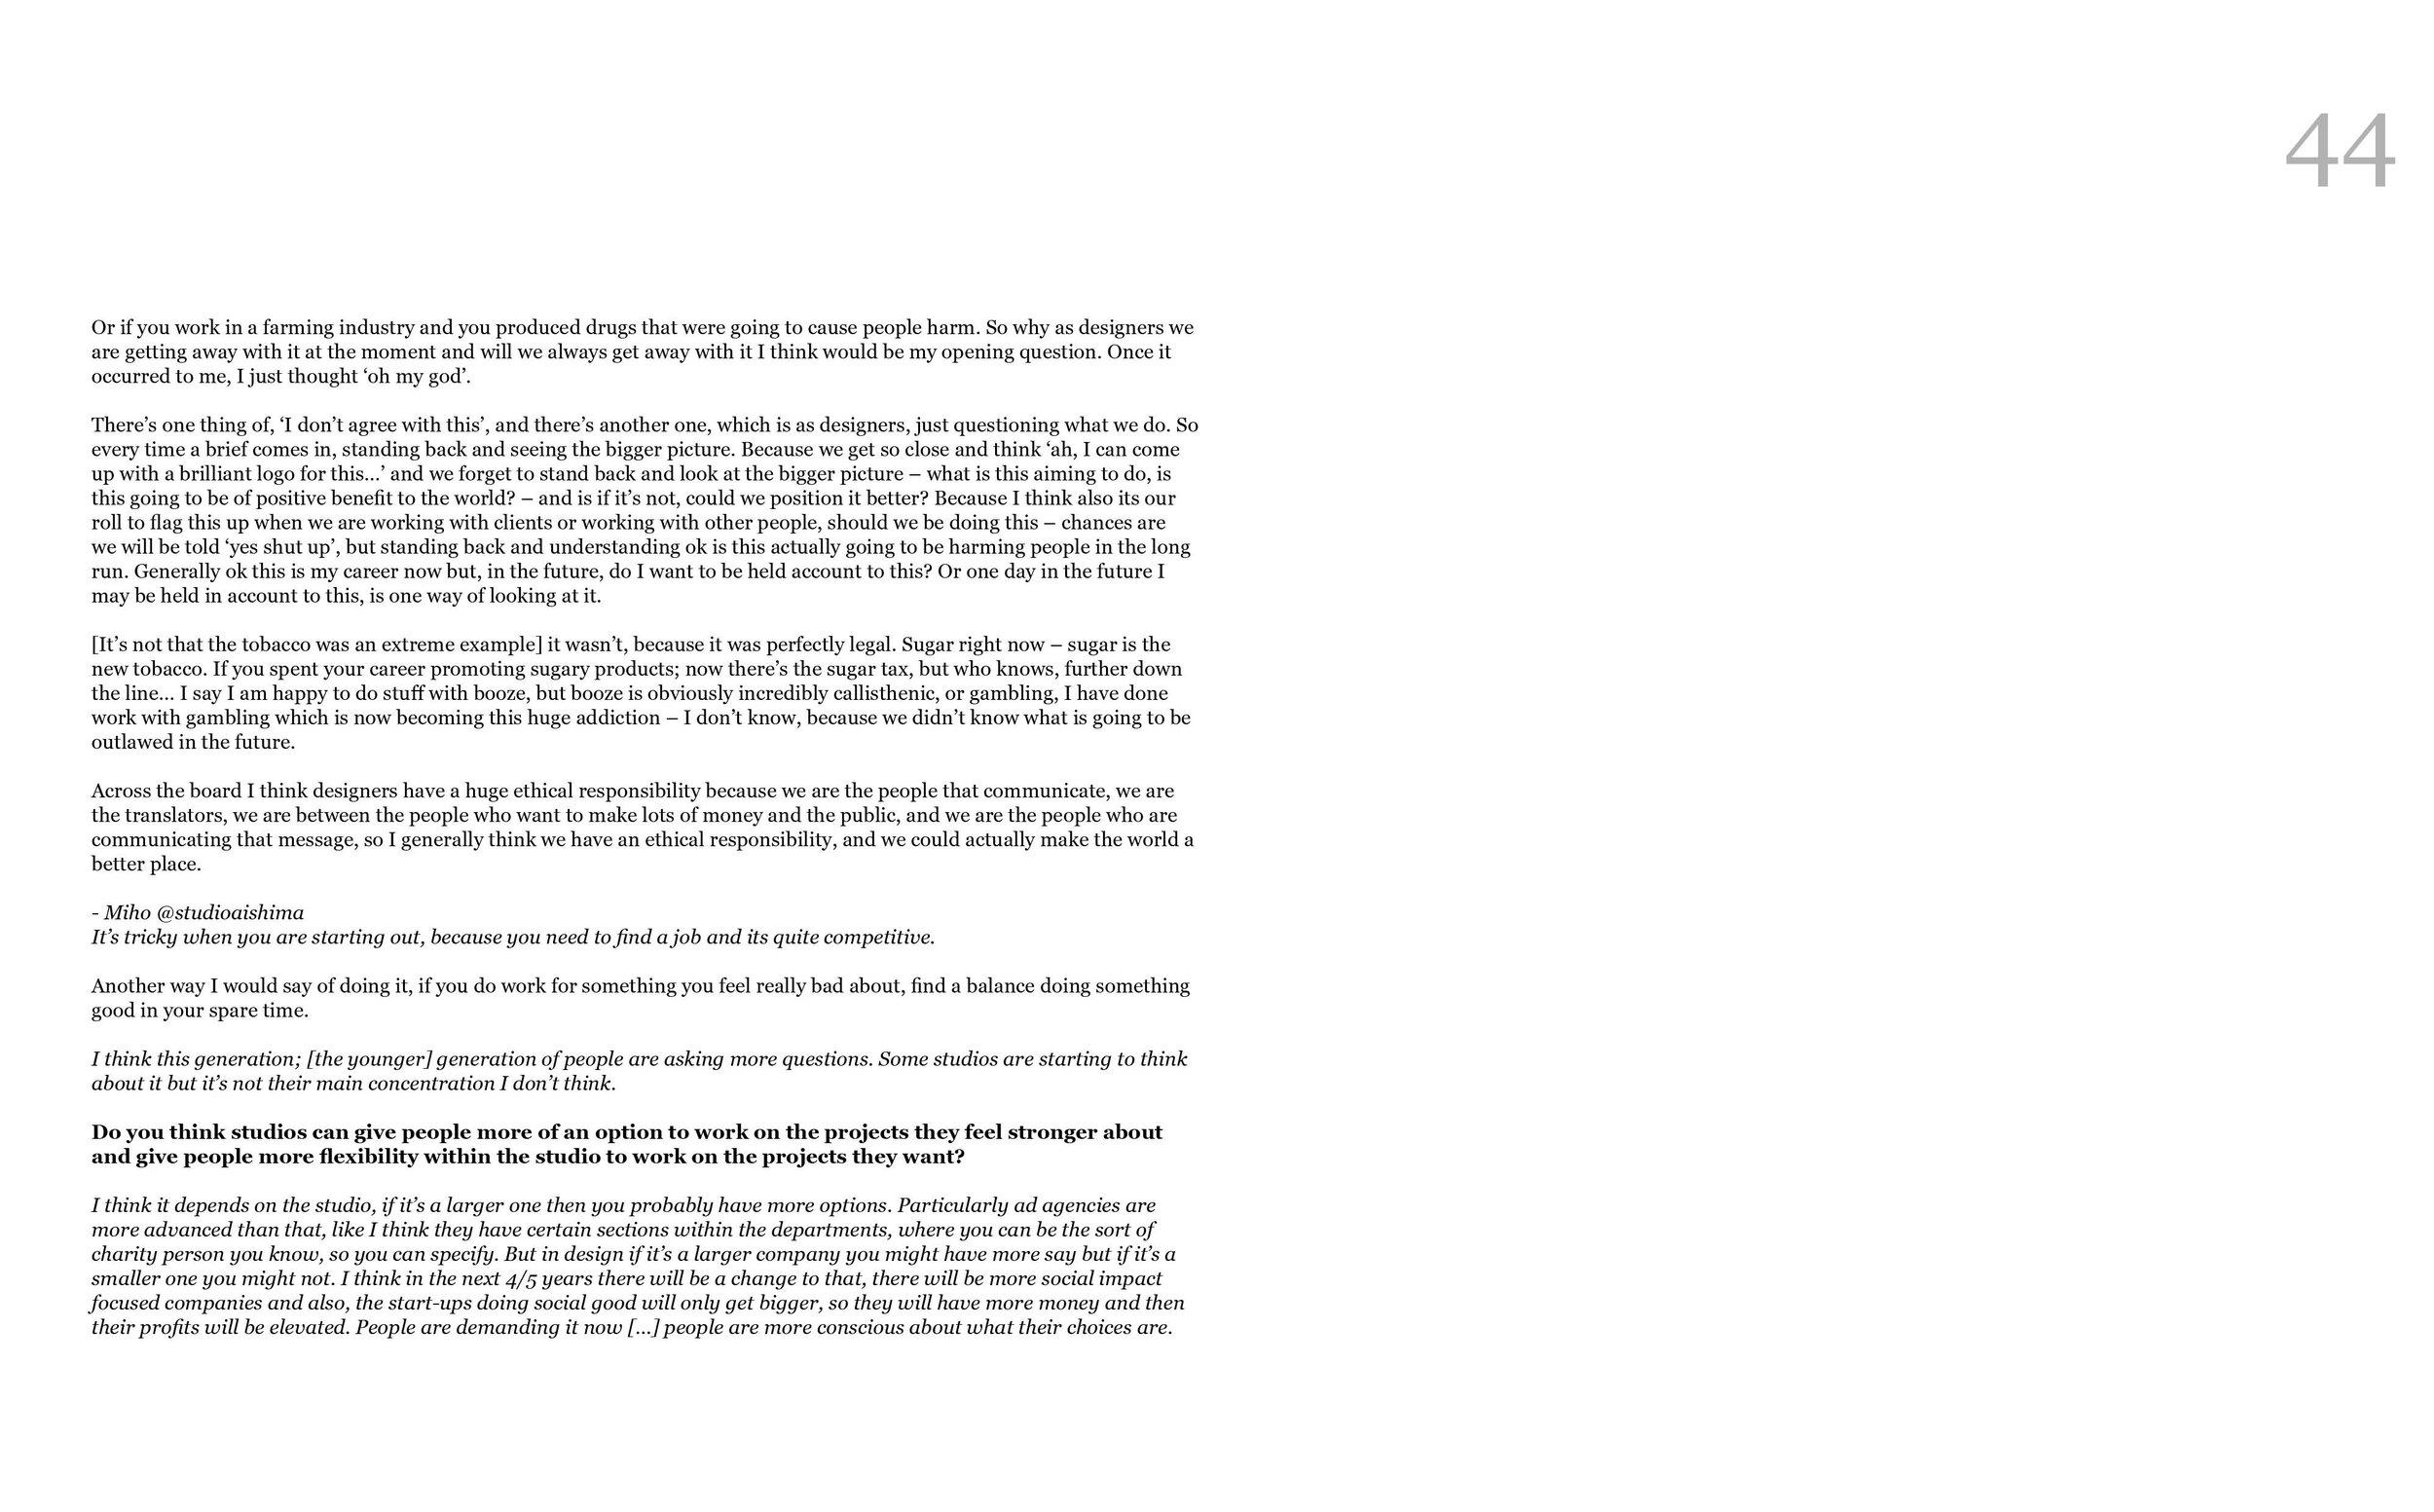 Thesis Element 2 PDF44.jpg